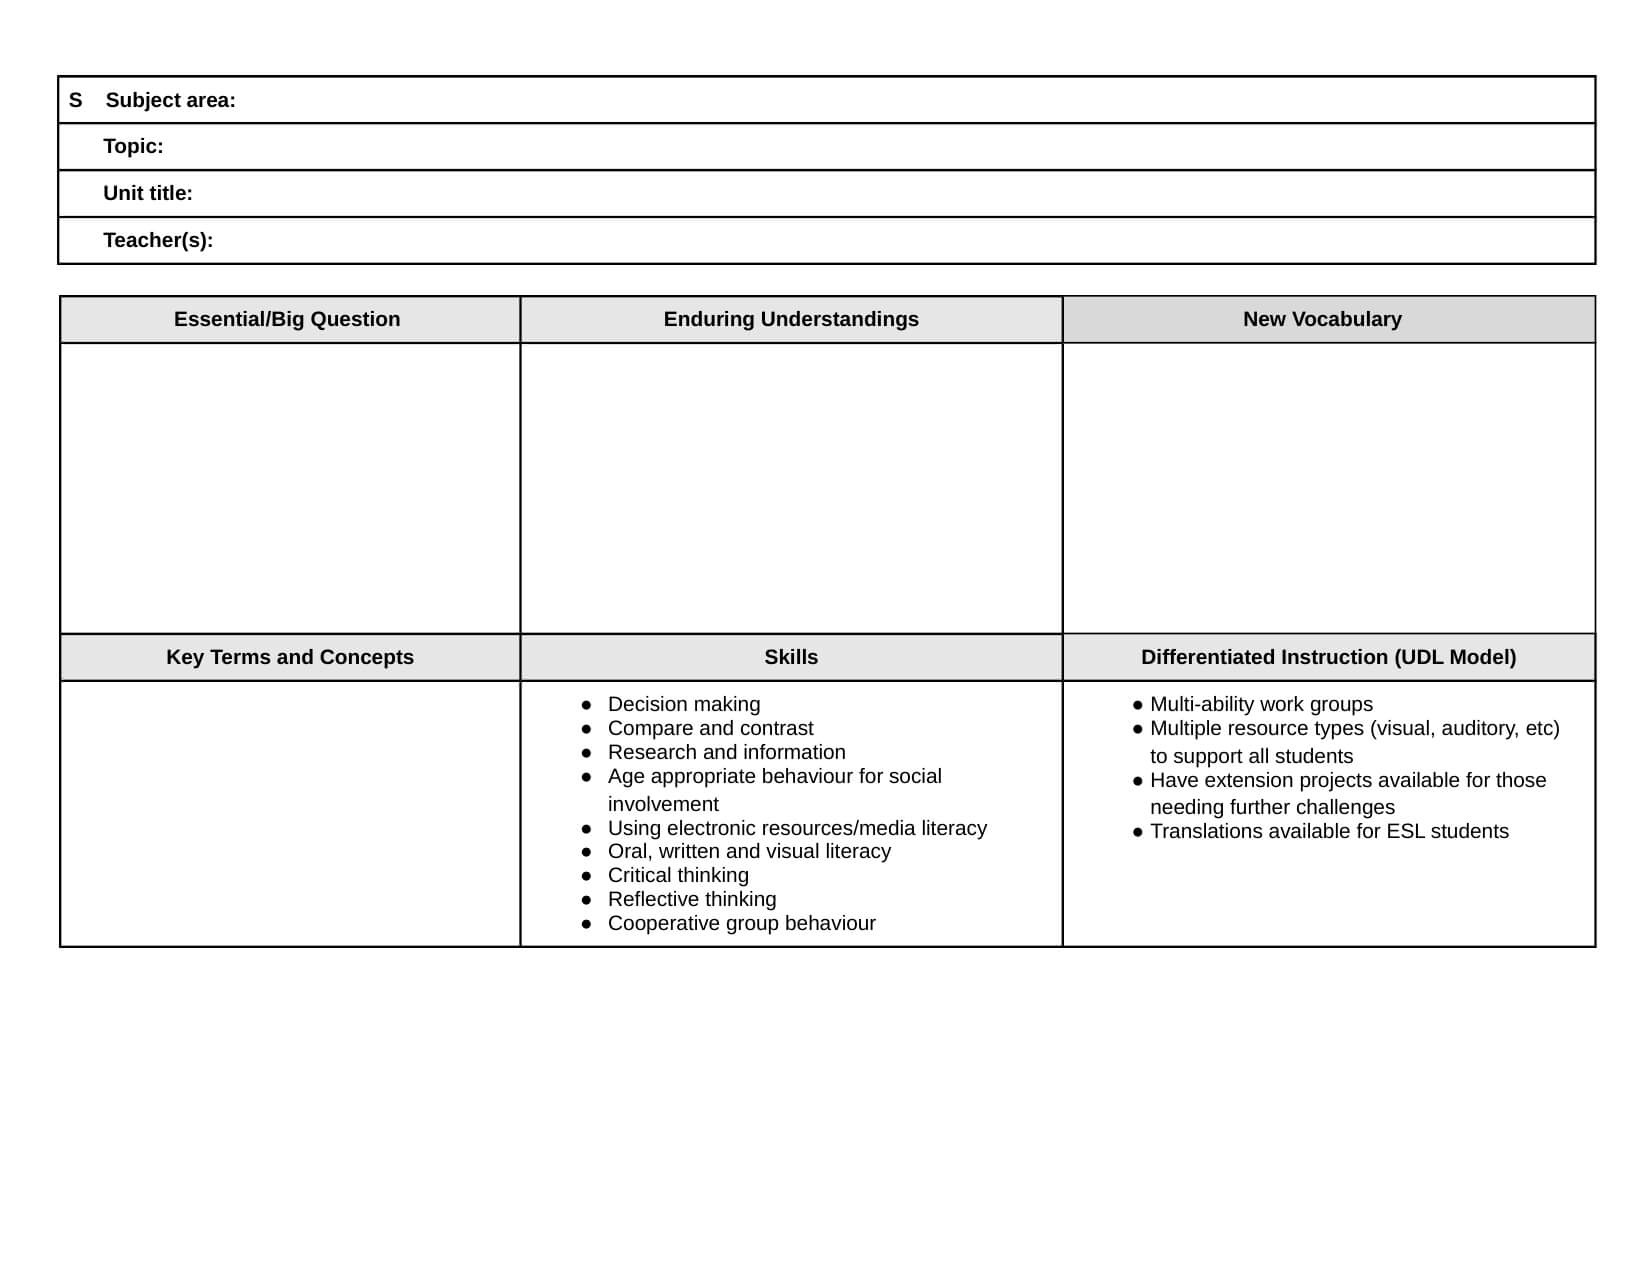 031 Unit Lesson Plan Template Blank Social Studies With Blank Unit Lesson Plan Template